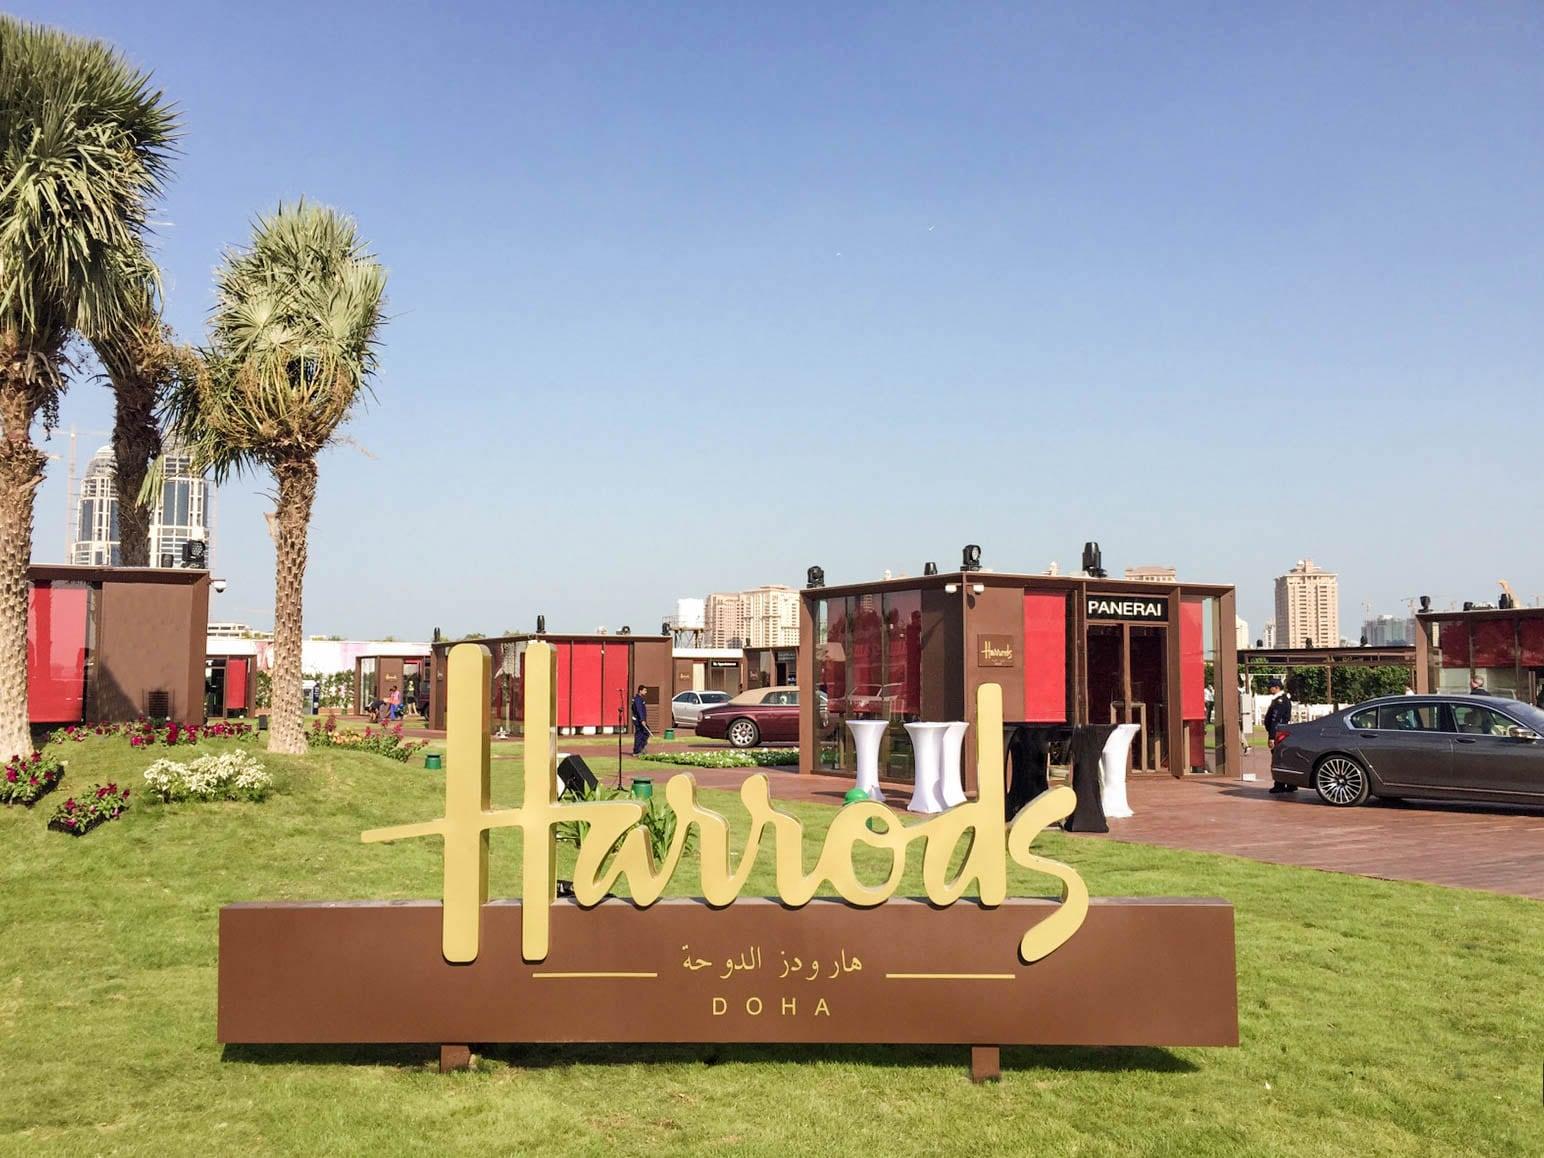 Harrods Village al Katara Cultural Village di Doha in Qatar